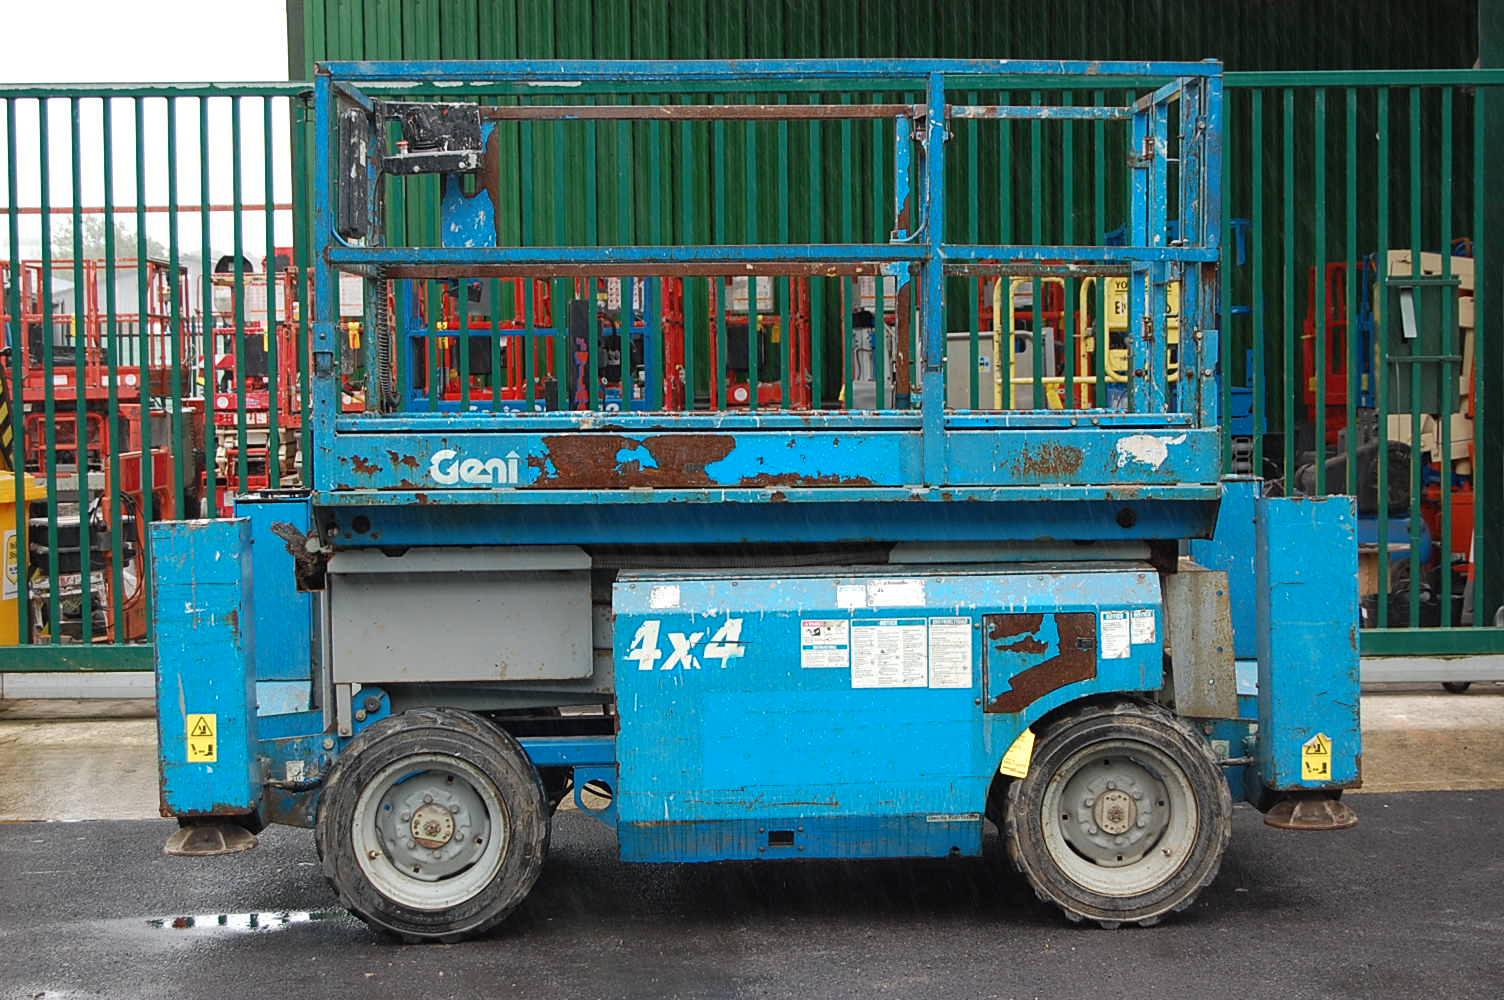 Genie 2668 Rough Terrain Diesel 10m Scissor Lift